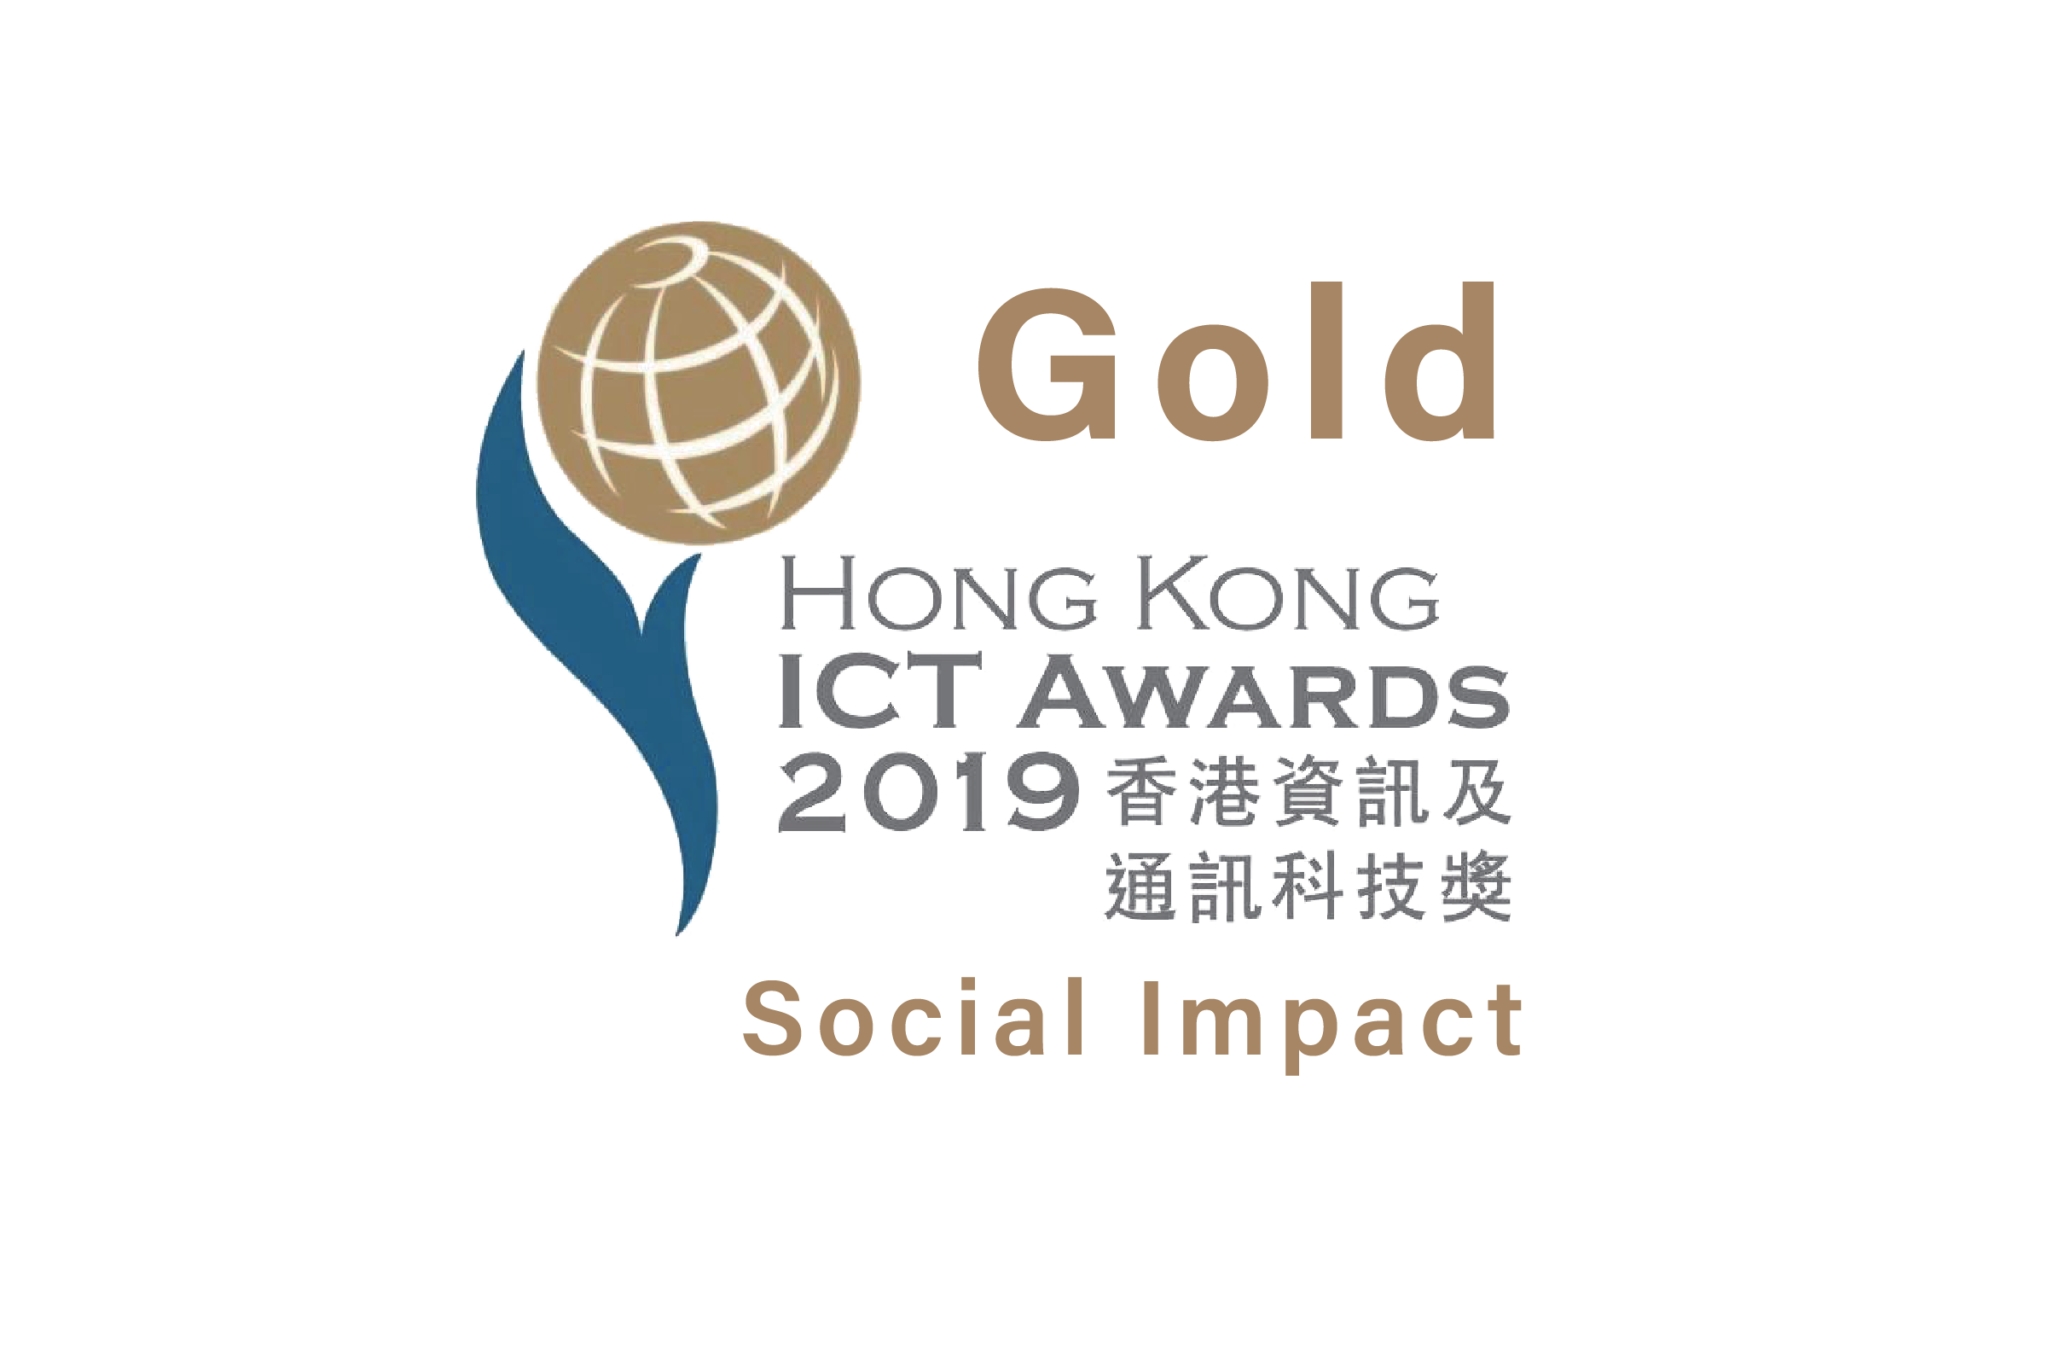 HKICT Startup Gold Award 2019